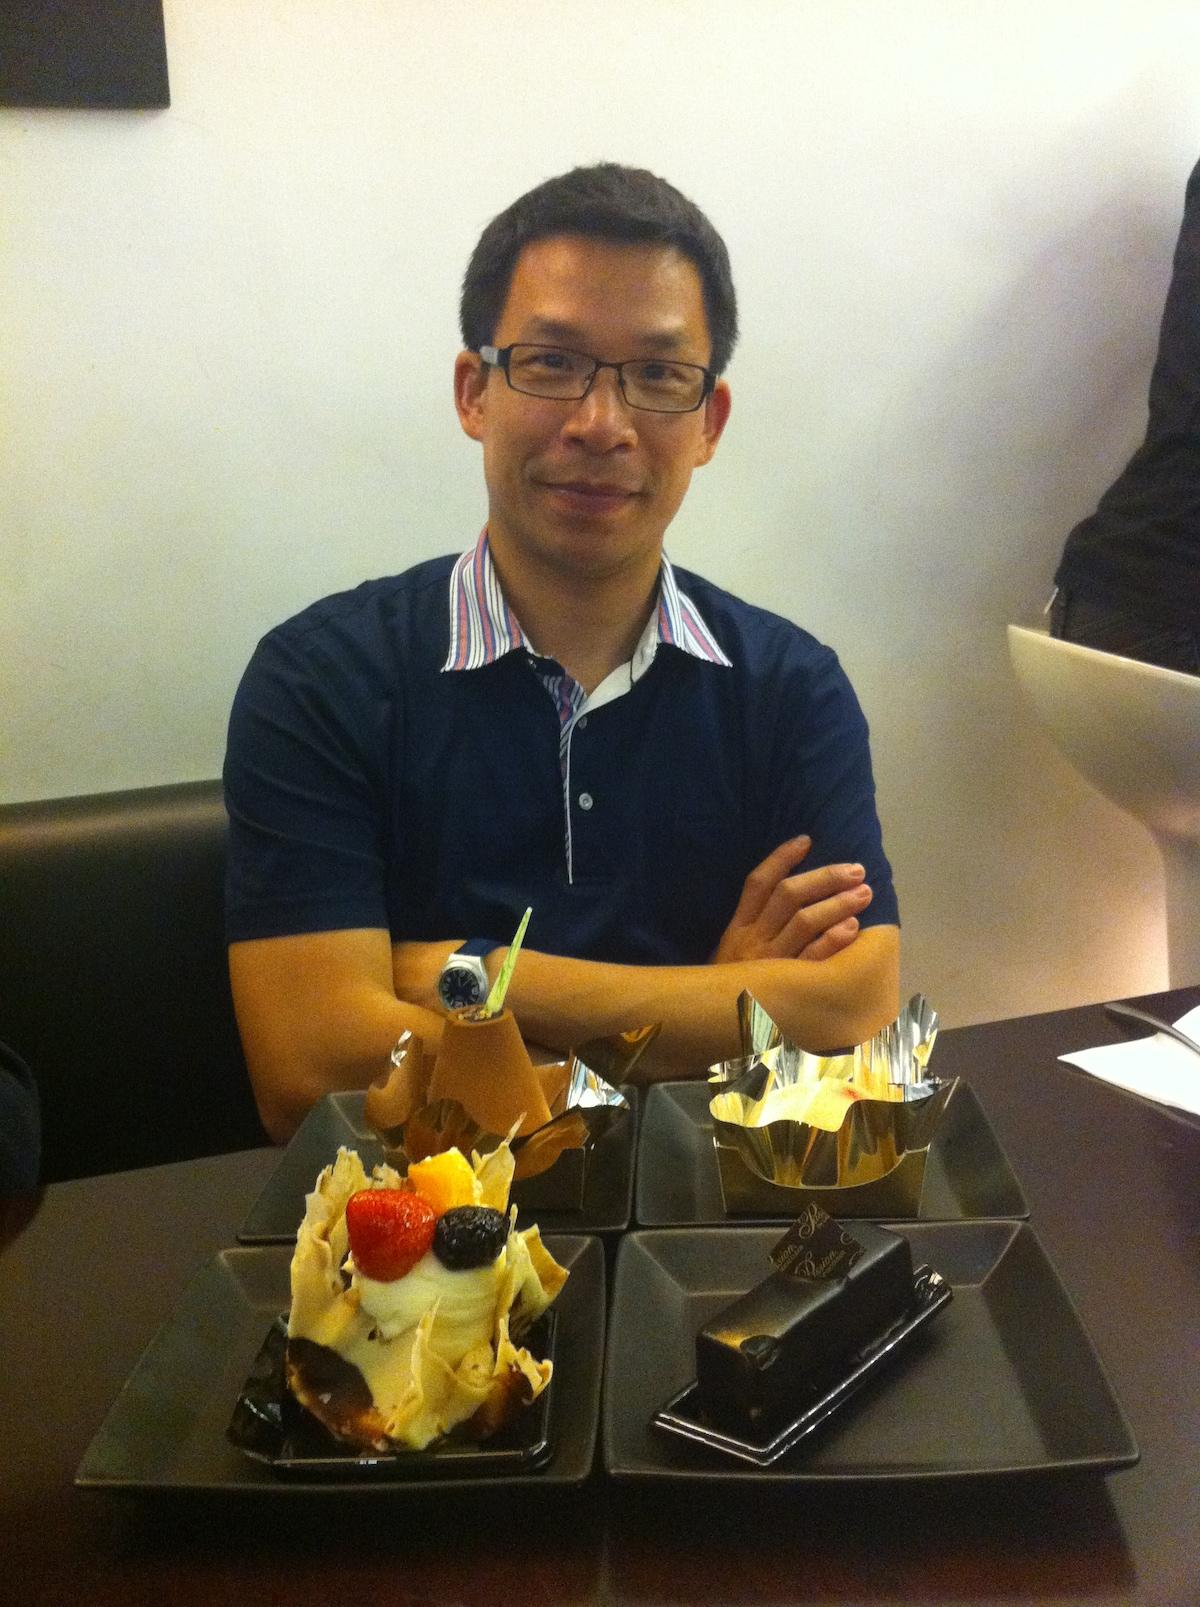 Bob Hon Hei